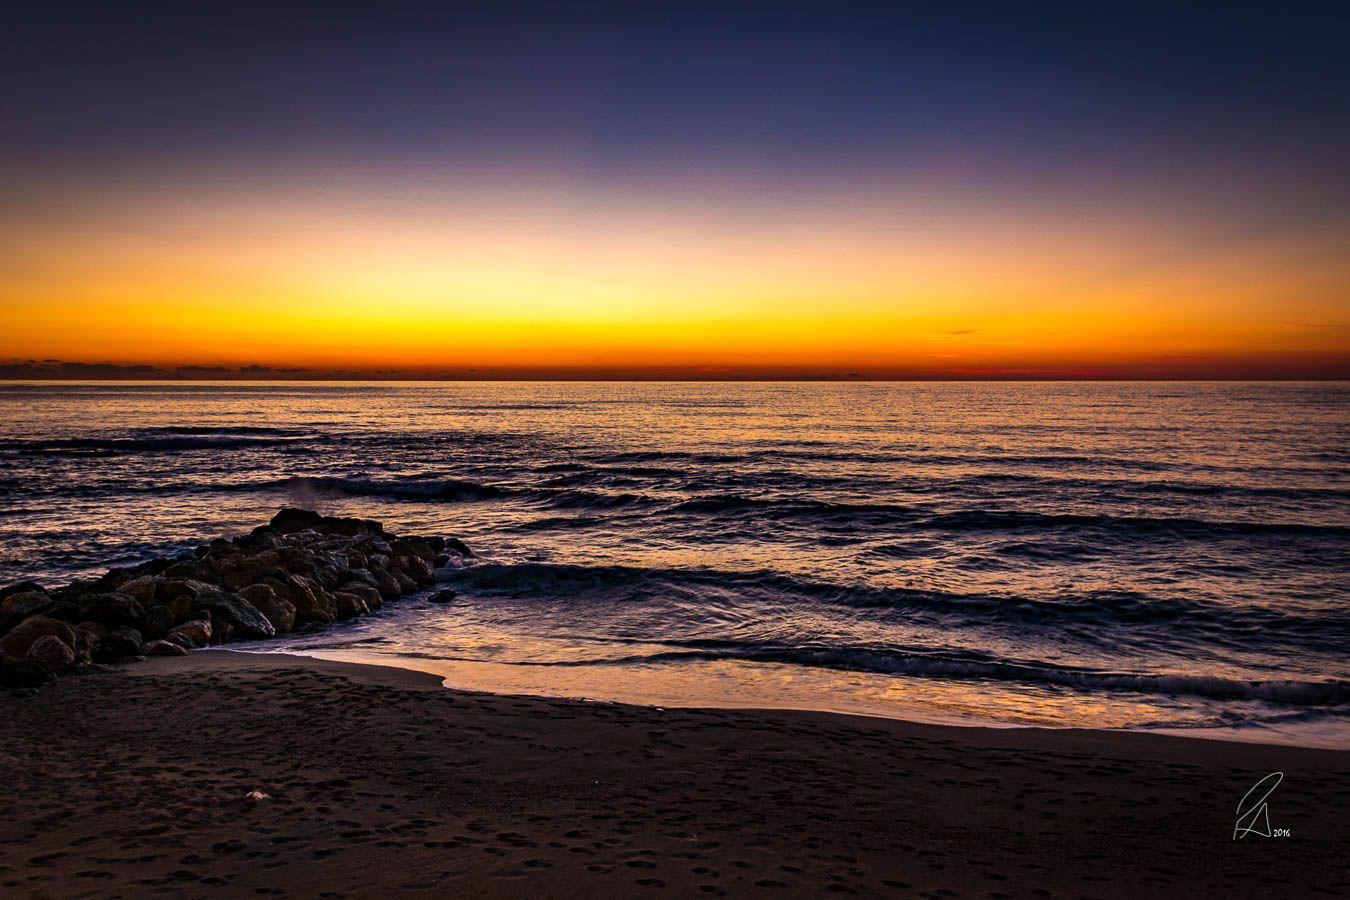 San Lucido's Twilight #Calabria #calabriainfoco #europe #Eurotrip #Italia #Italy #pier #SanLucido #Sea #sunset #turism #urbanexploration #Vacation #winter